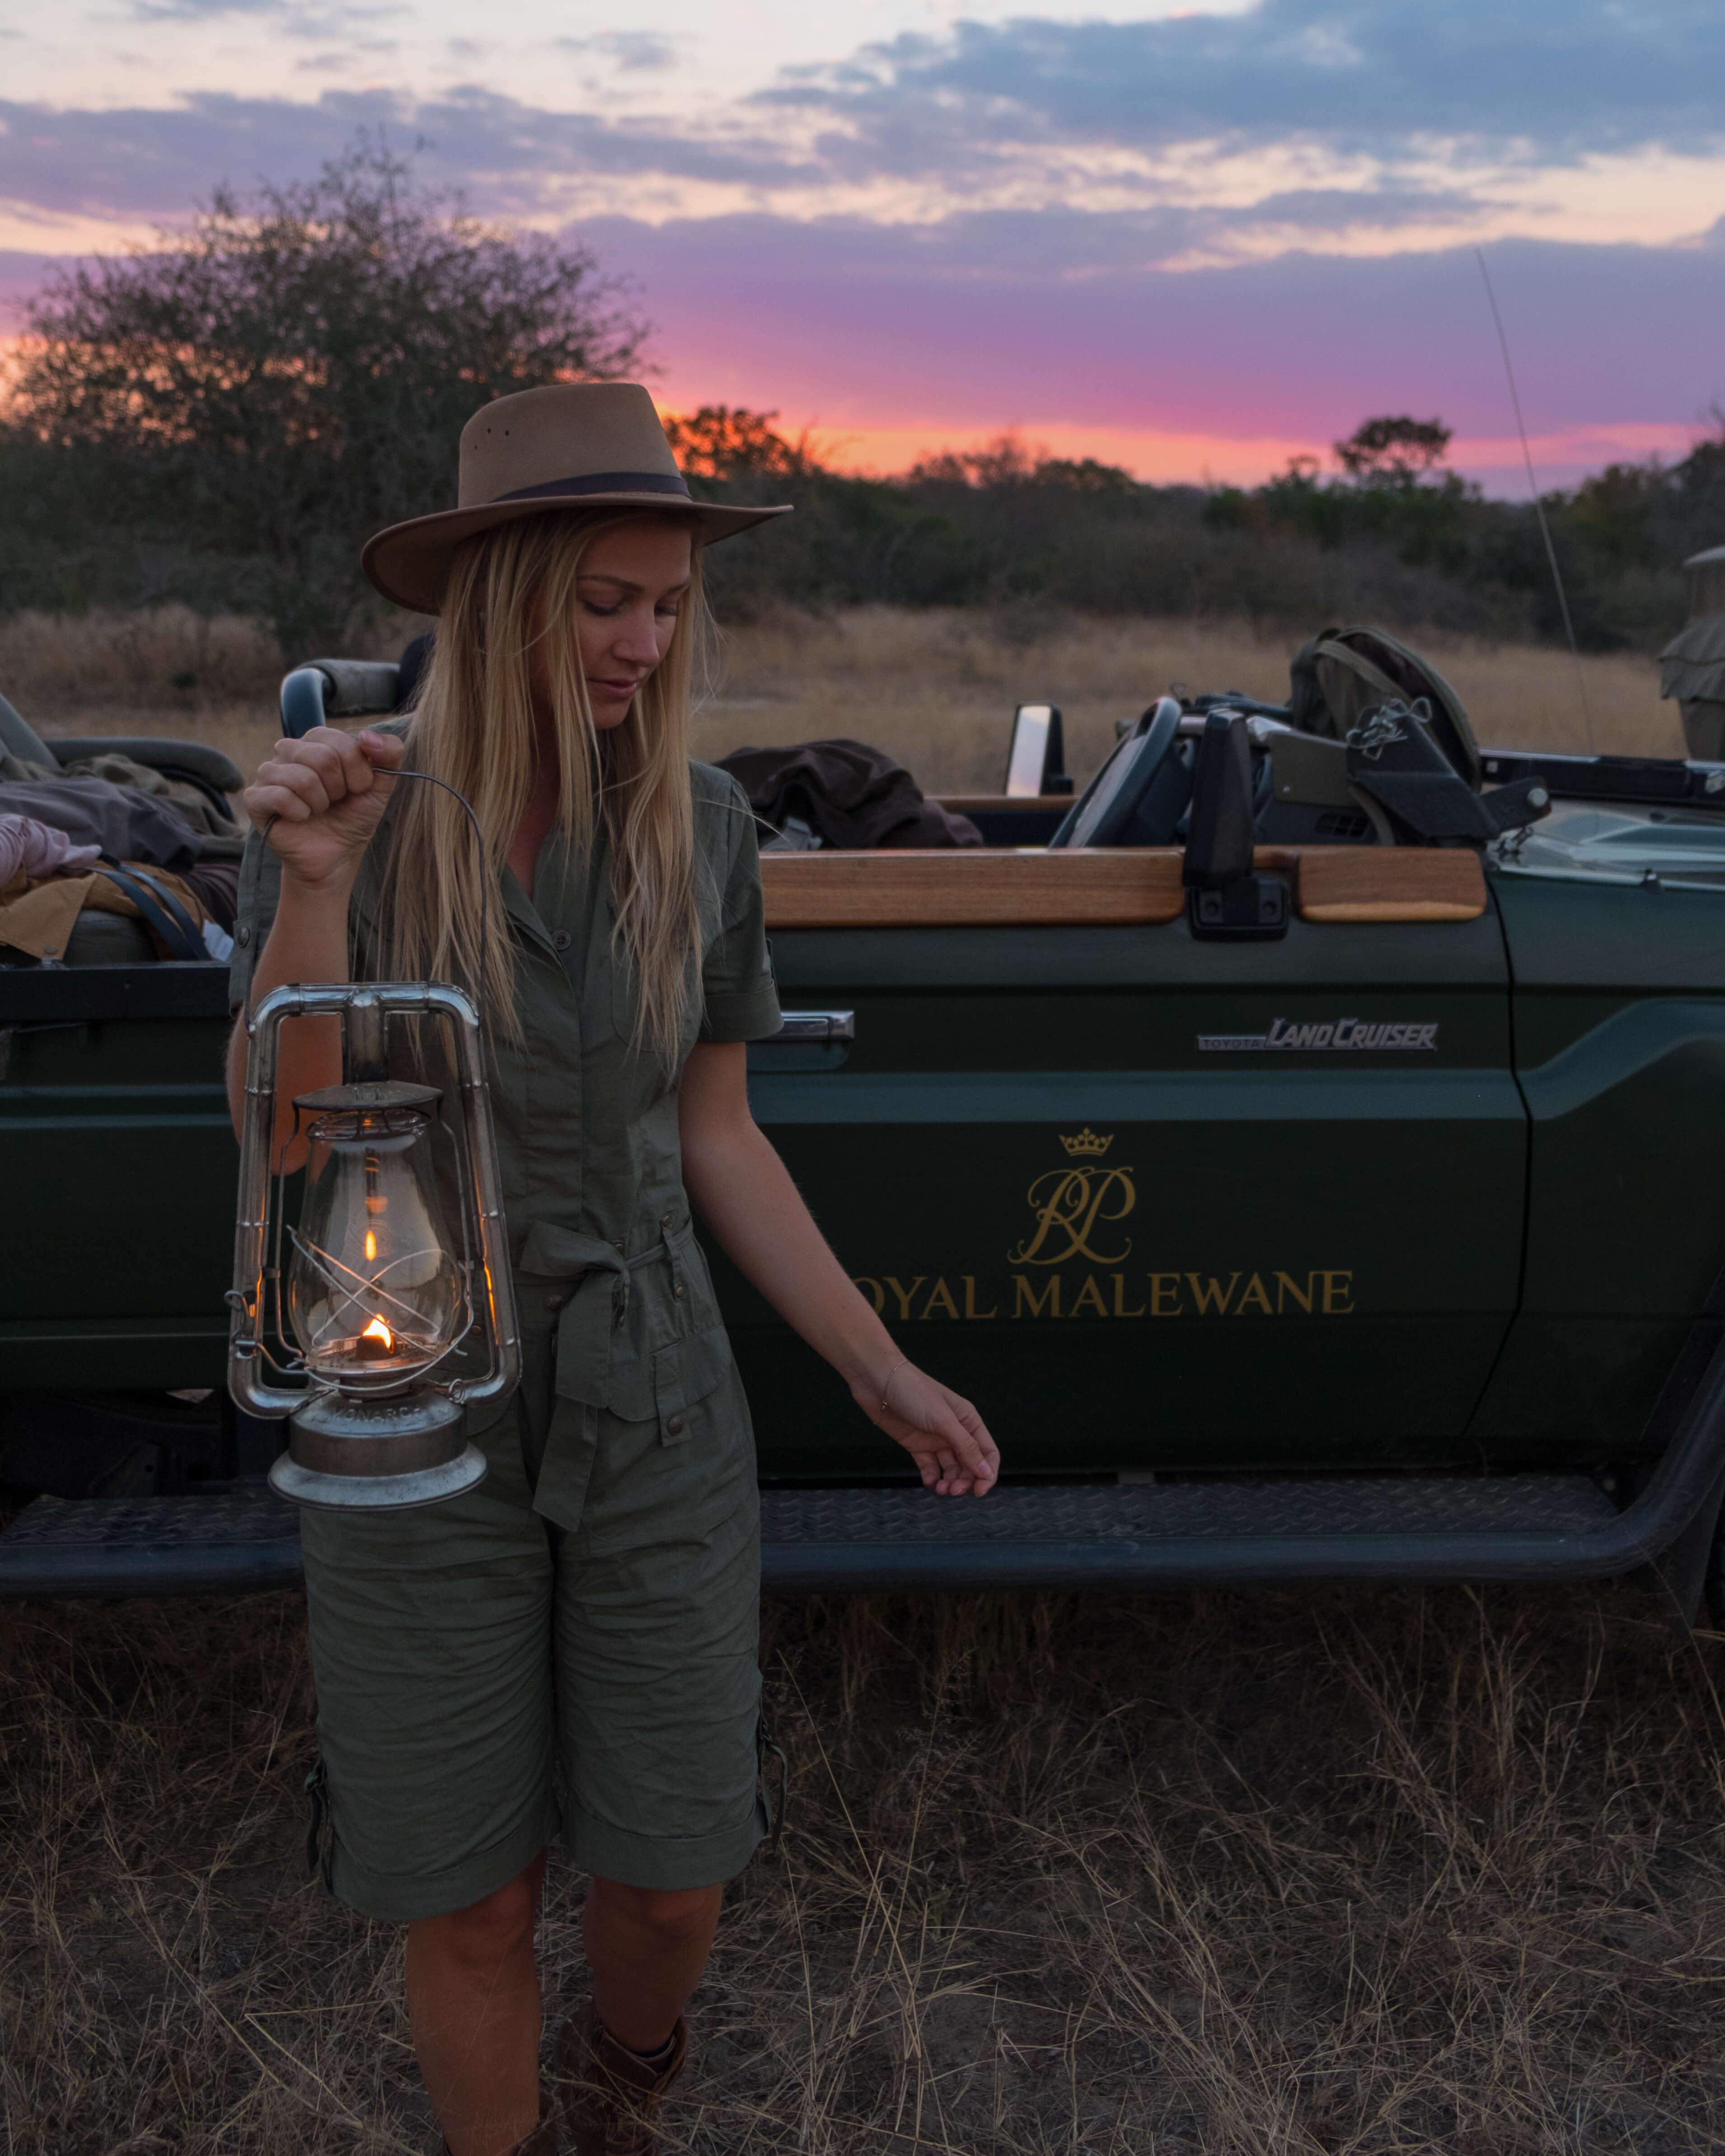 sunset safari blonde south africa